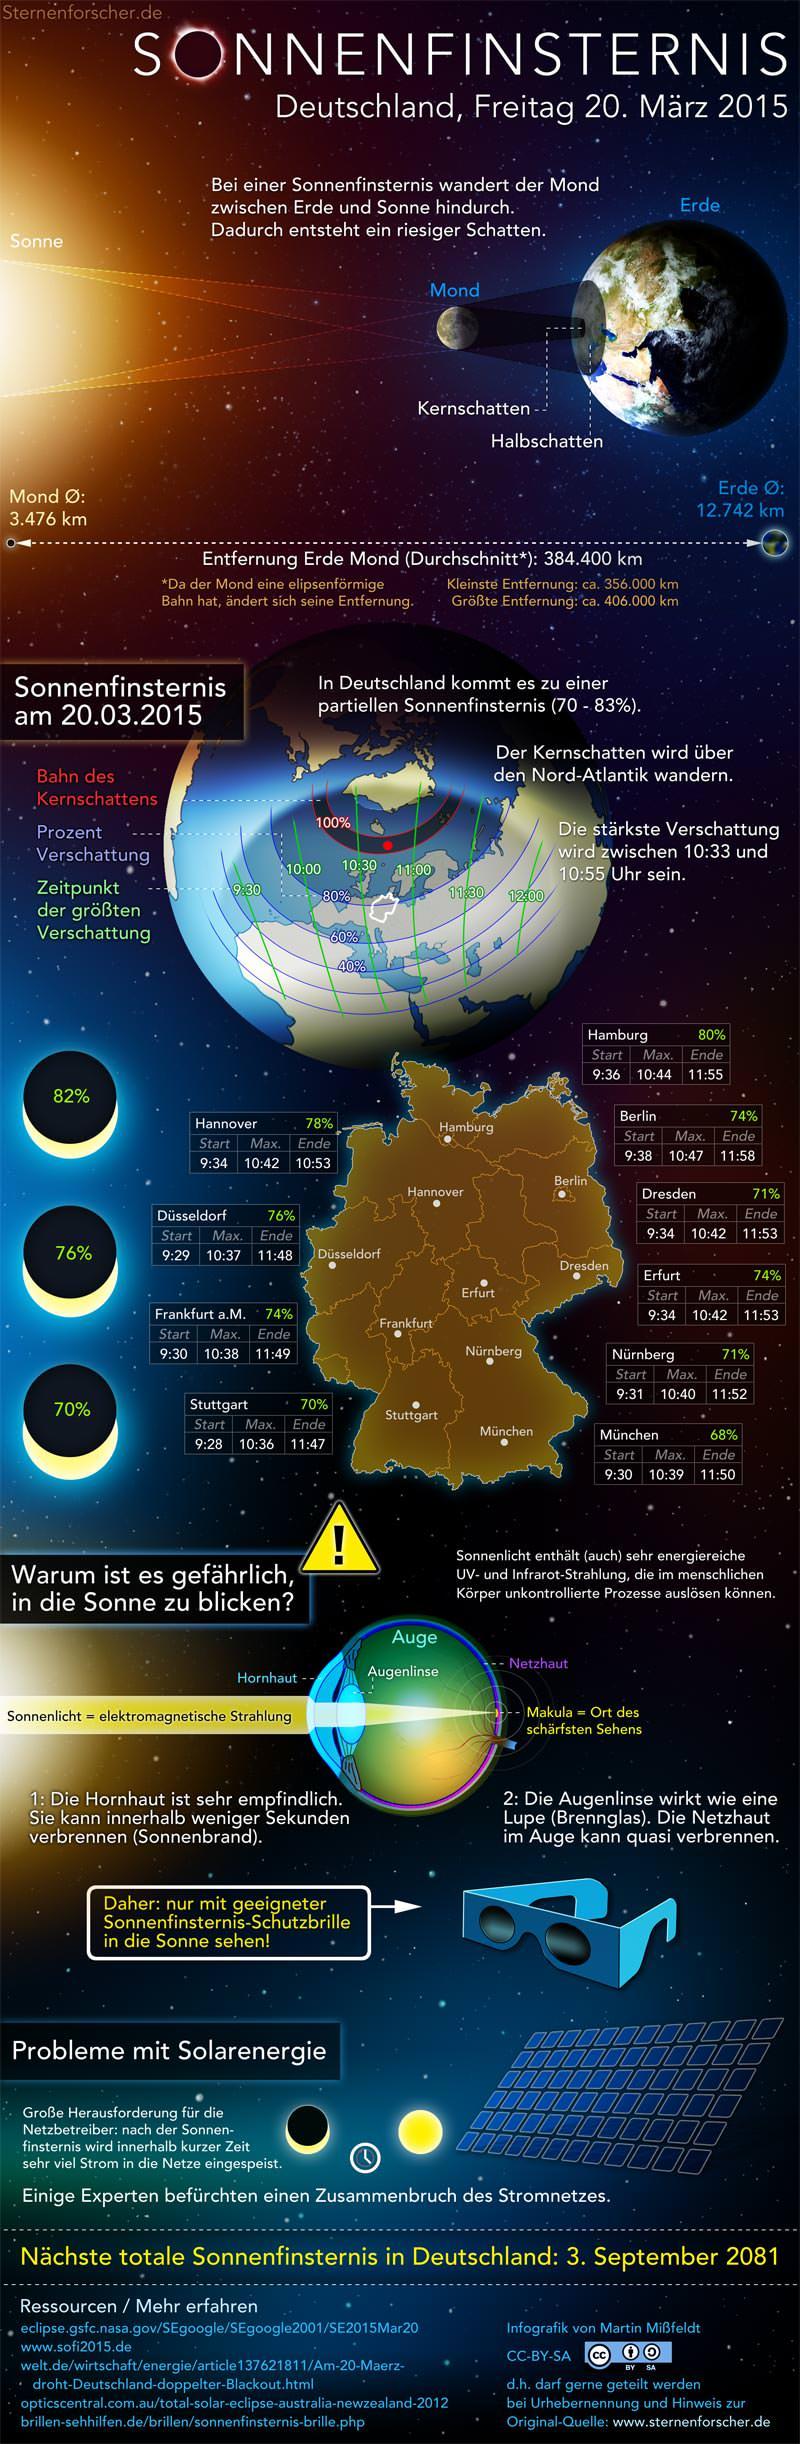 Info-Grafik zur Sonnenfinsternis am 20.3.2015 - Bild: Martin Mißfeldt/www.sternenforscher.de, CC-BY-SA 4.0